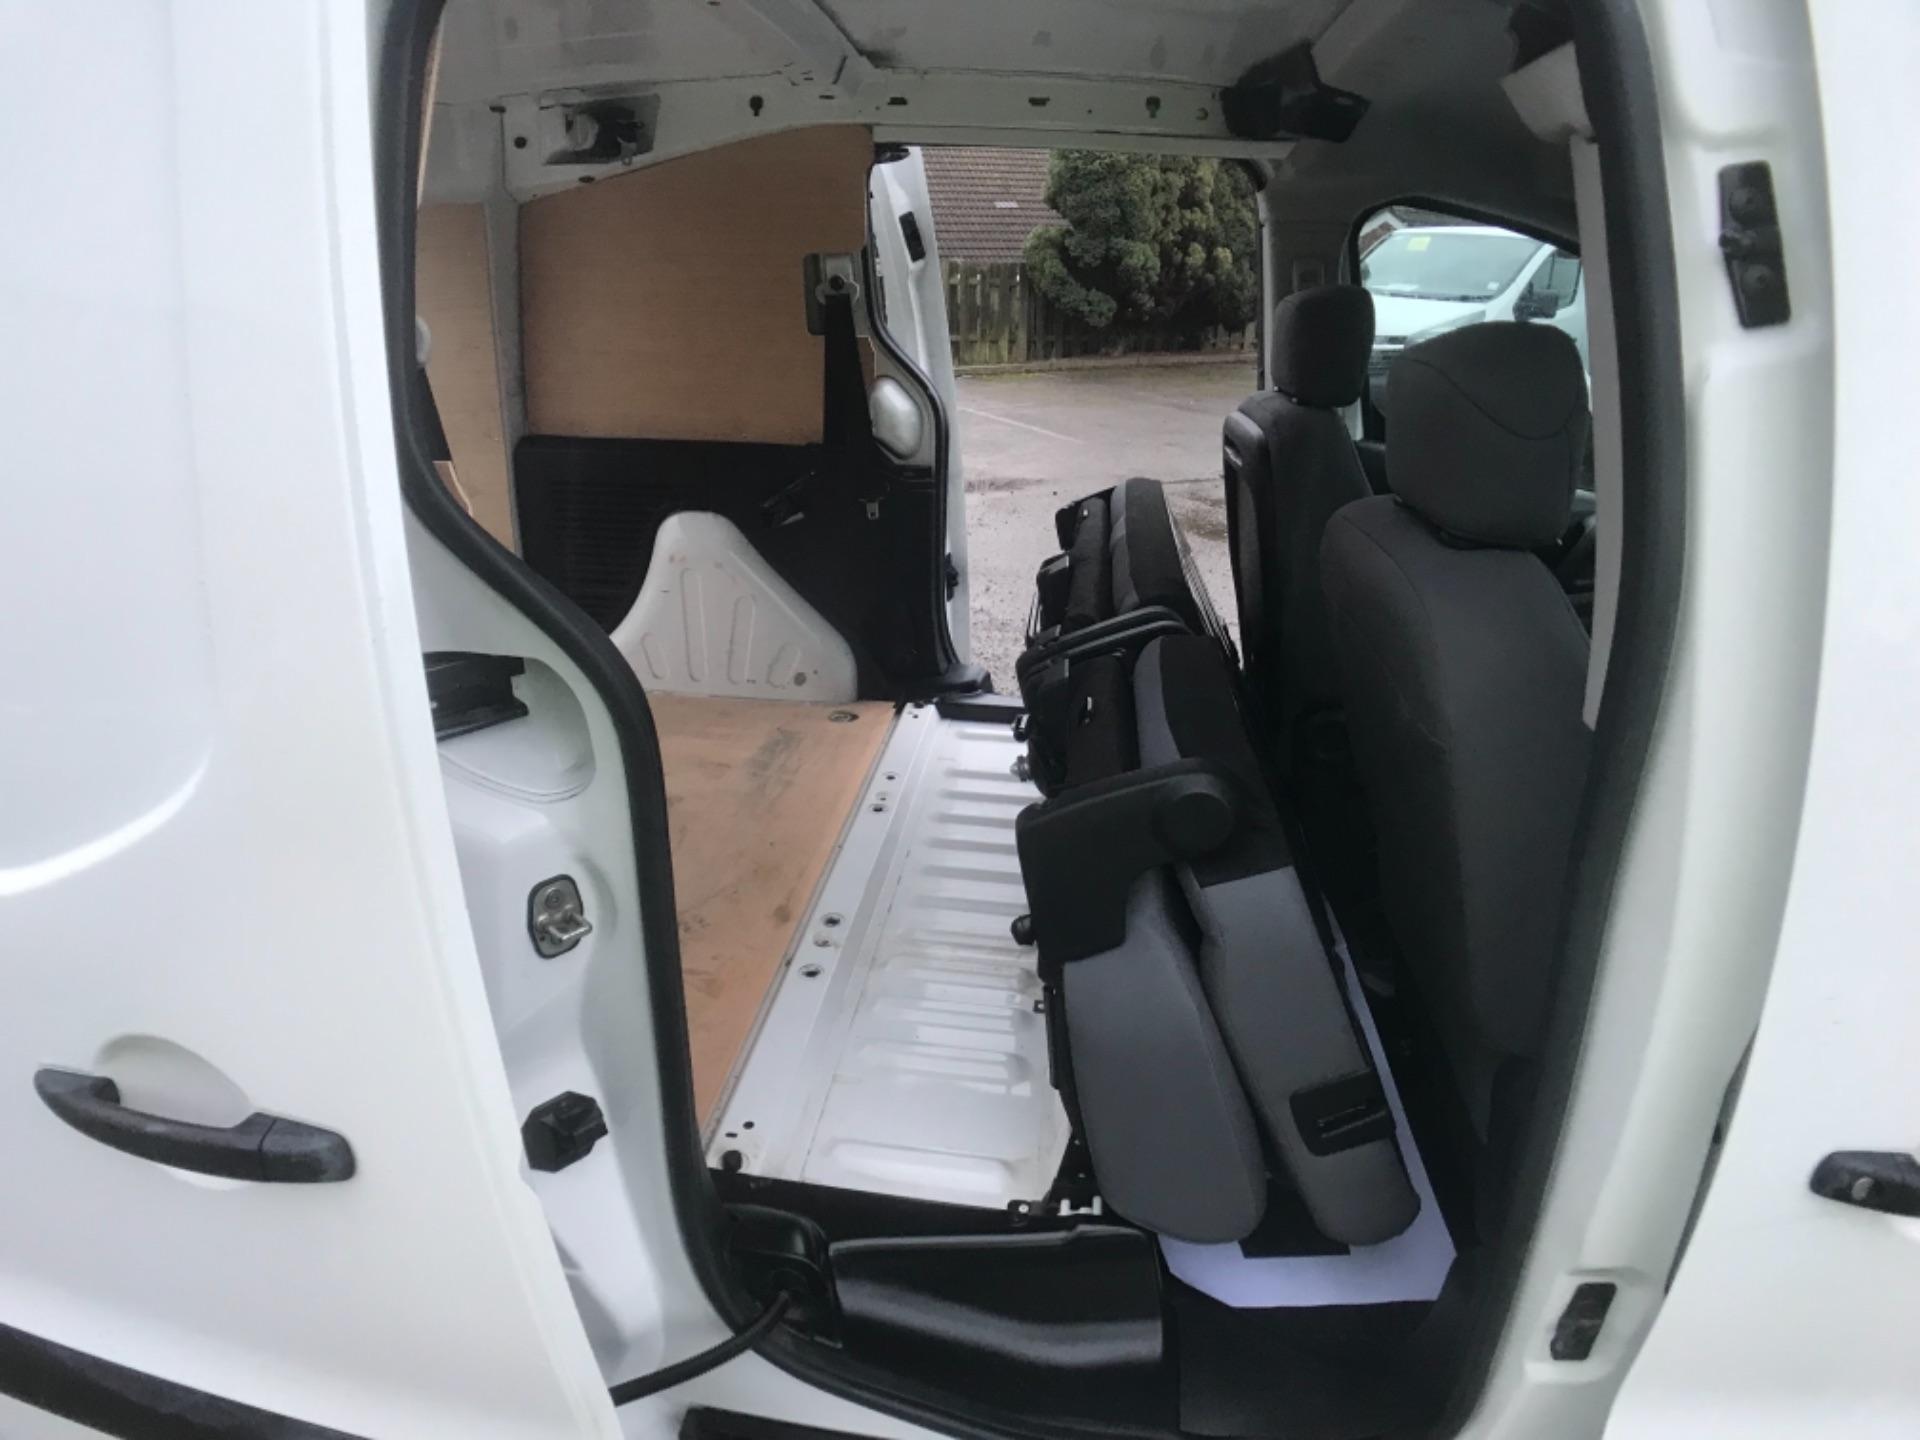 2016 Peugeot Partner 715 S 1.6 Hdi 92 Crew Van Euro 5 (NU16XWM) Image 11